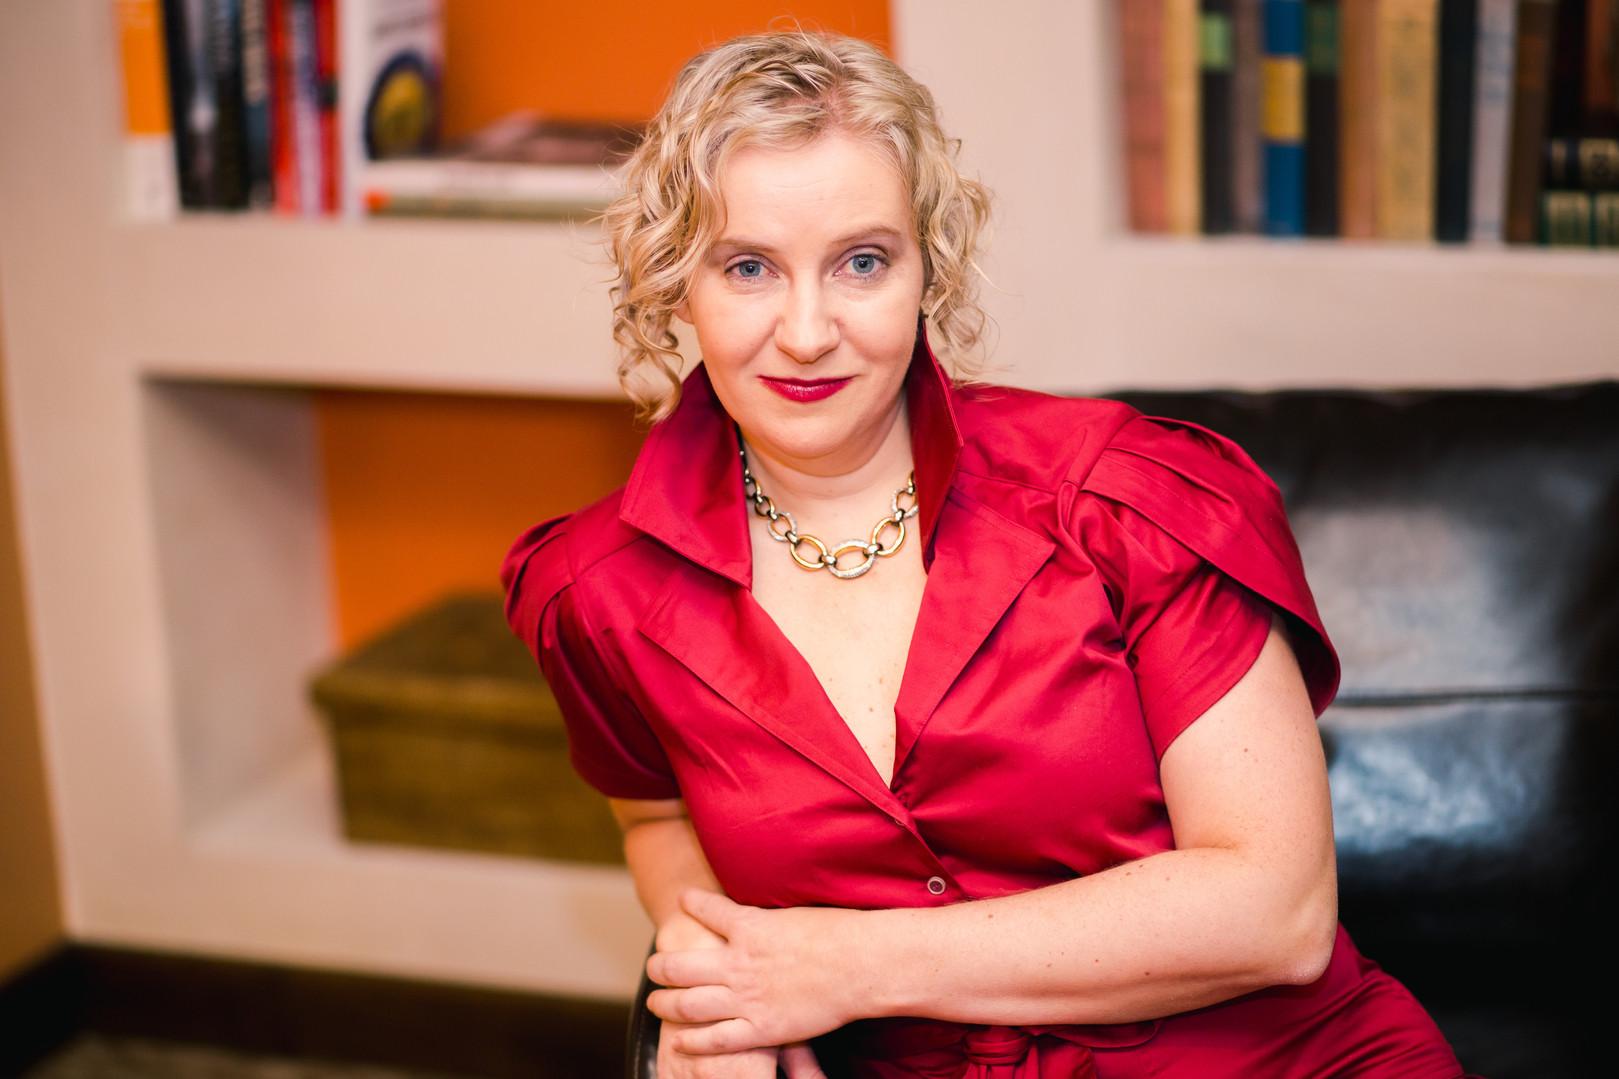 Diana Stelin: Professional Artist, Author, Educator & Fashion Designer